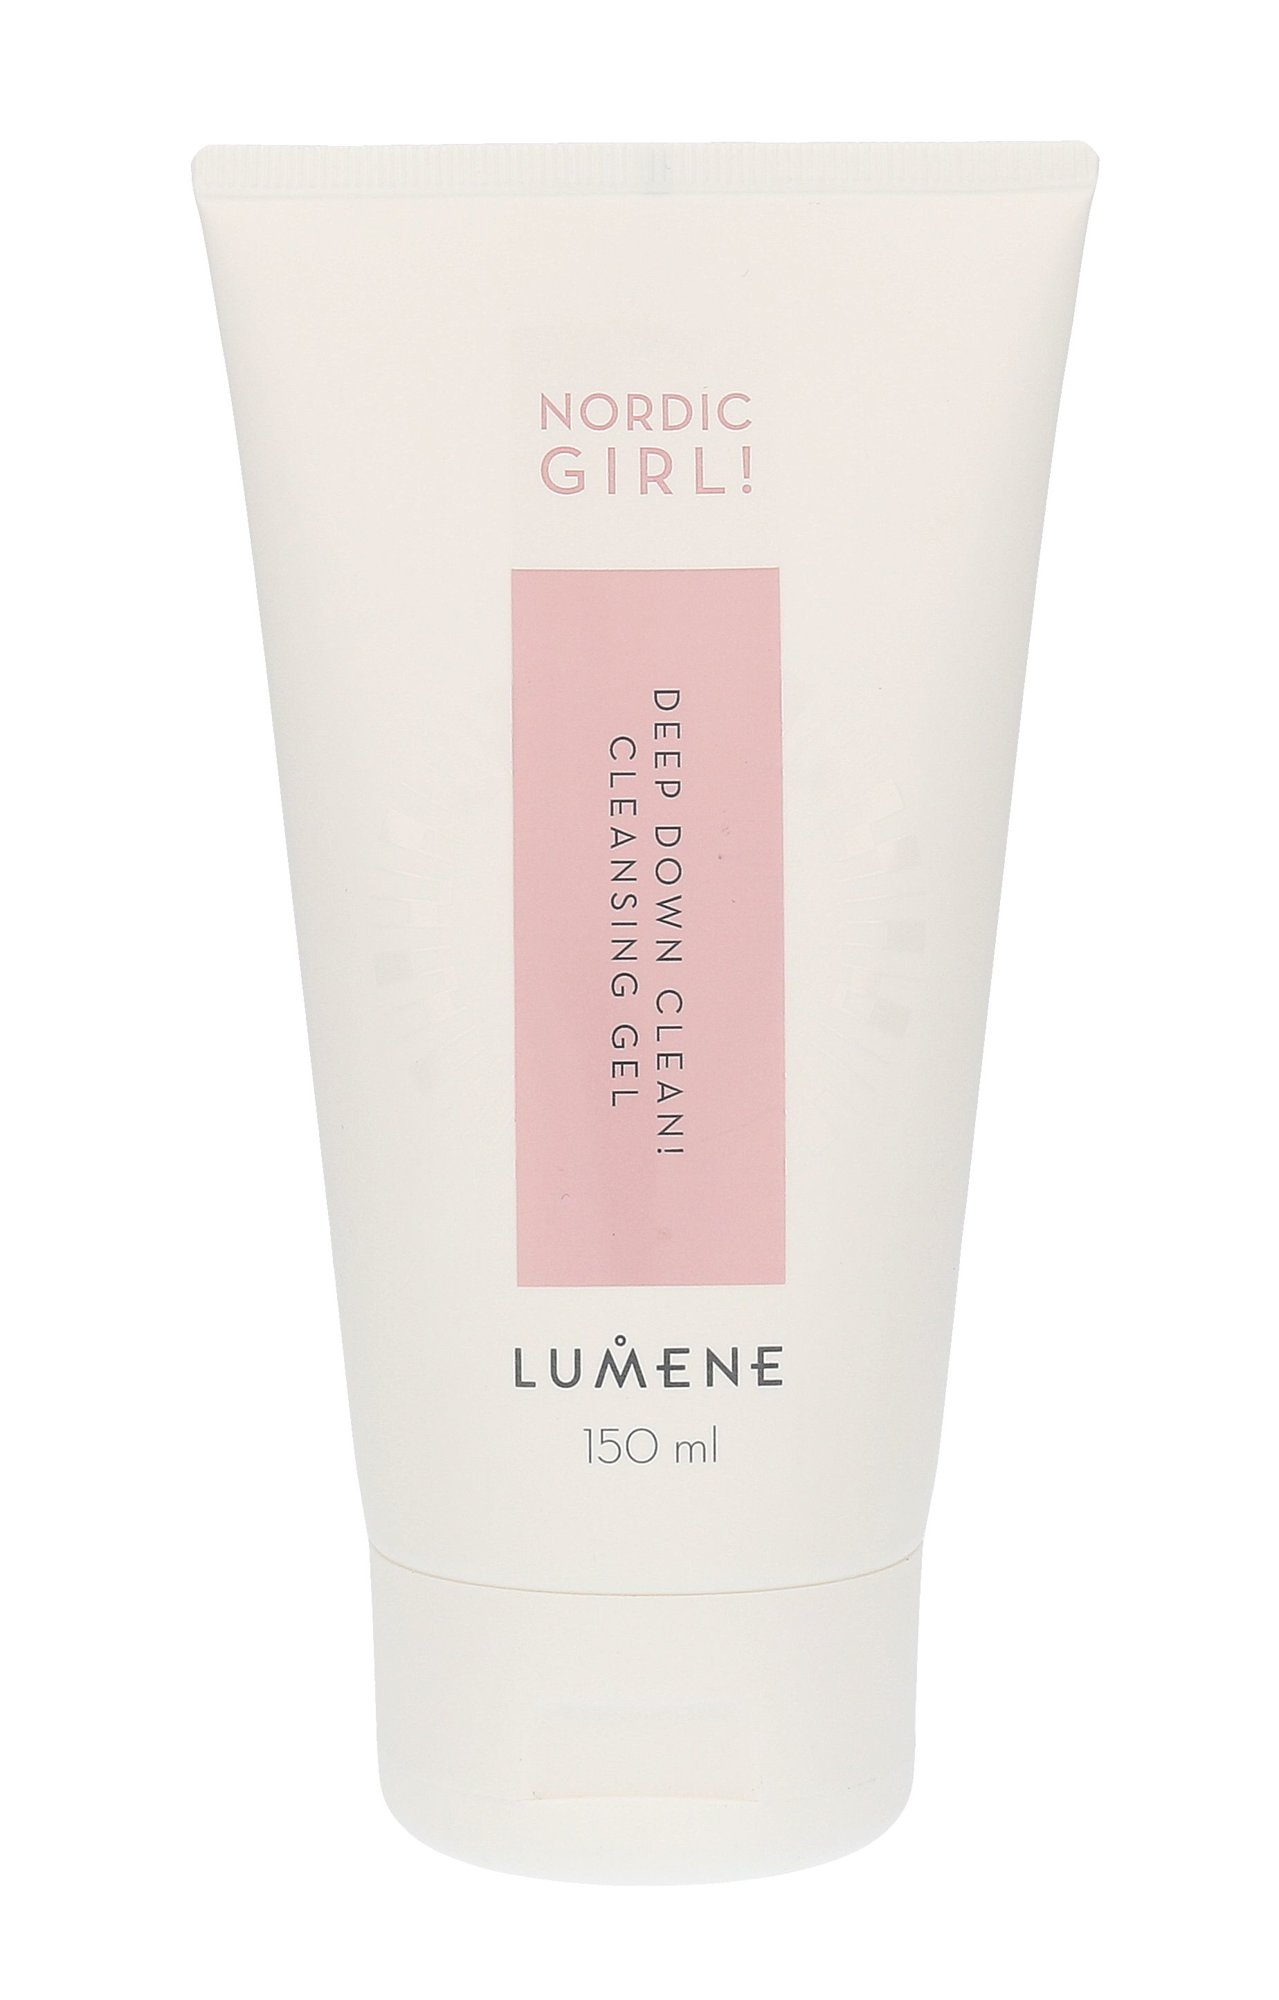 Lumene Nordic Girl! Cosmetic 150ml